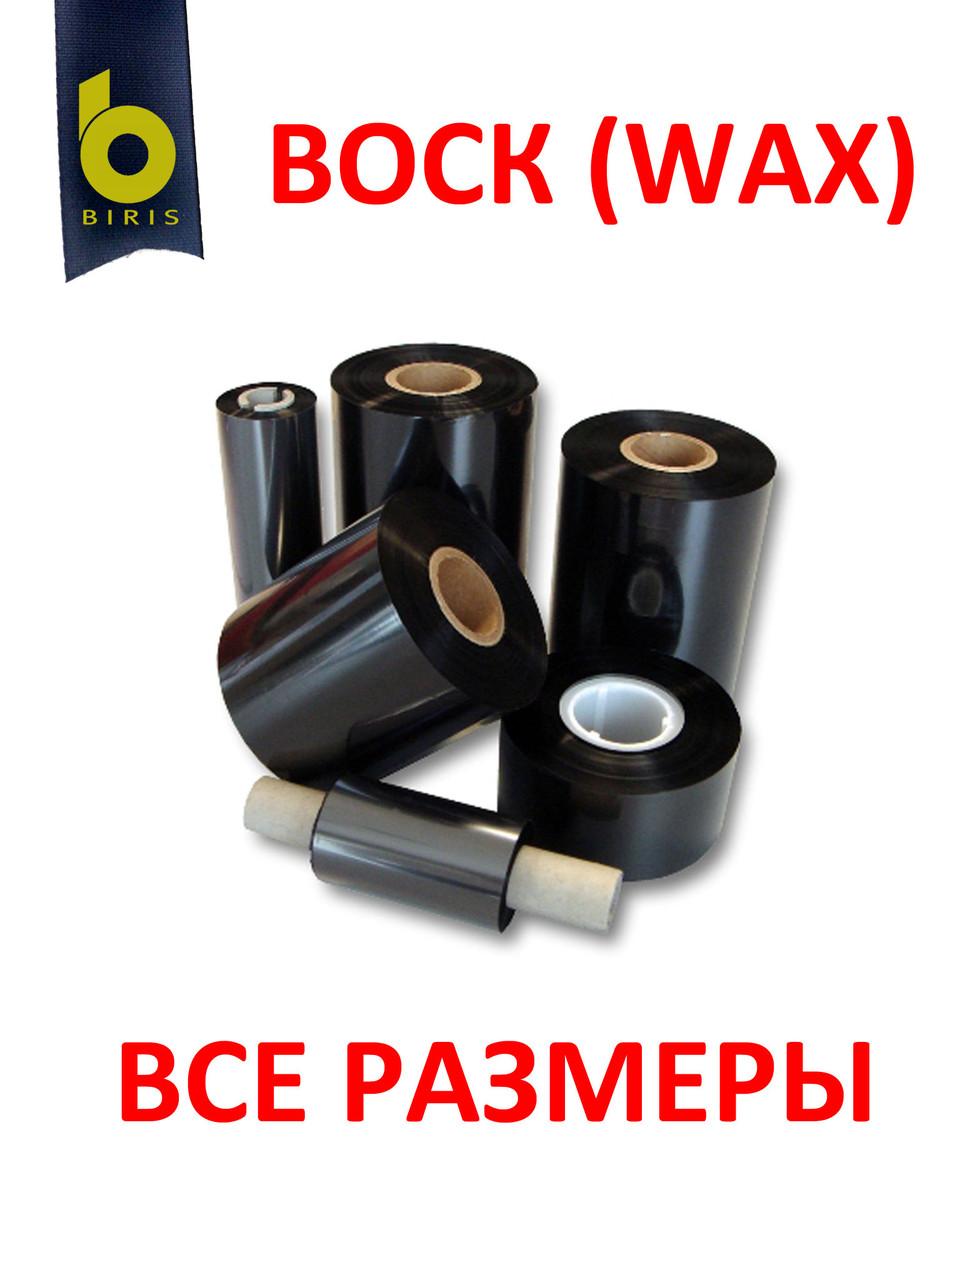 Риббон wax (воск)